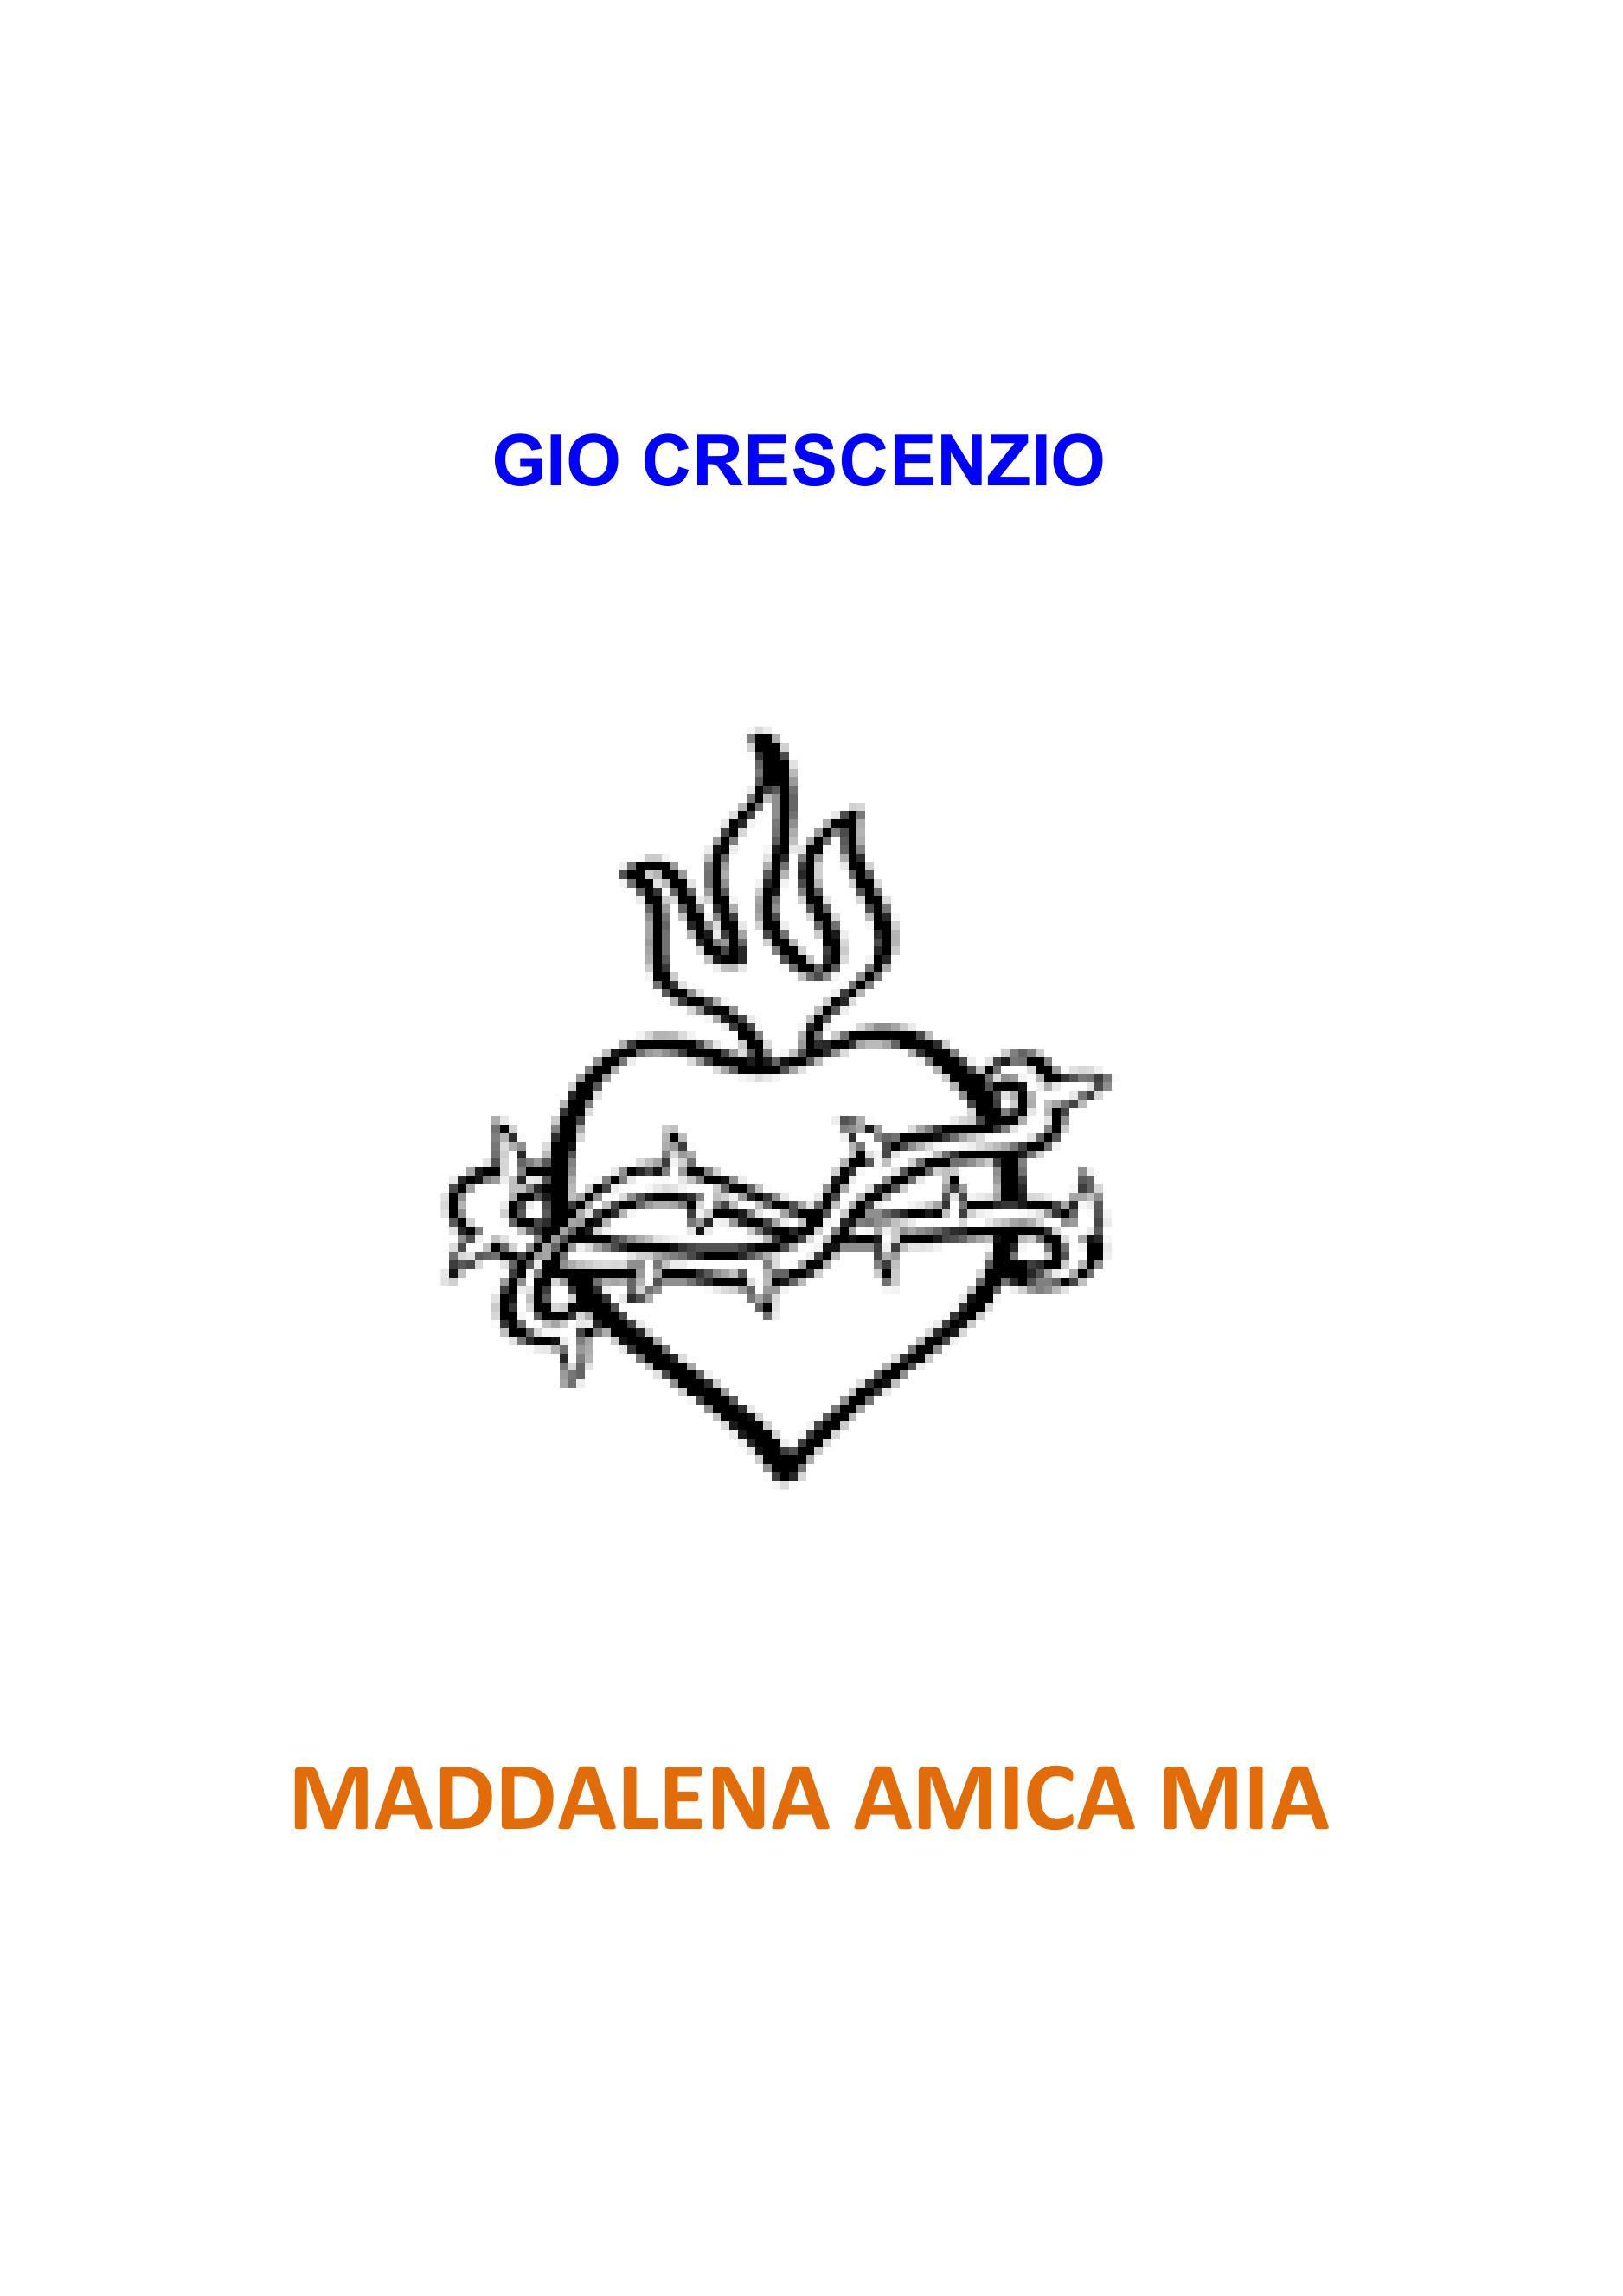 Maddalena amica mia